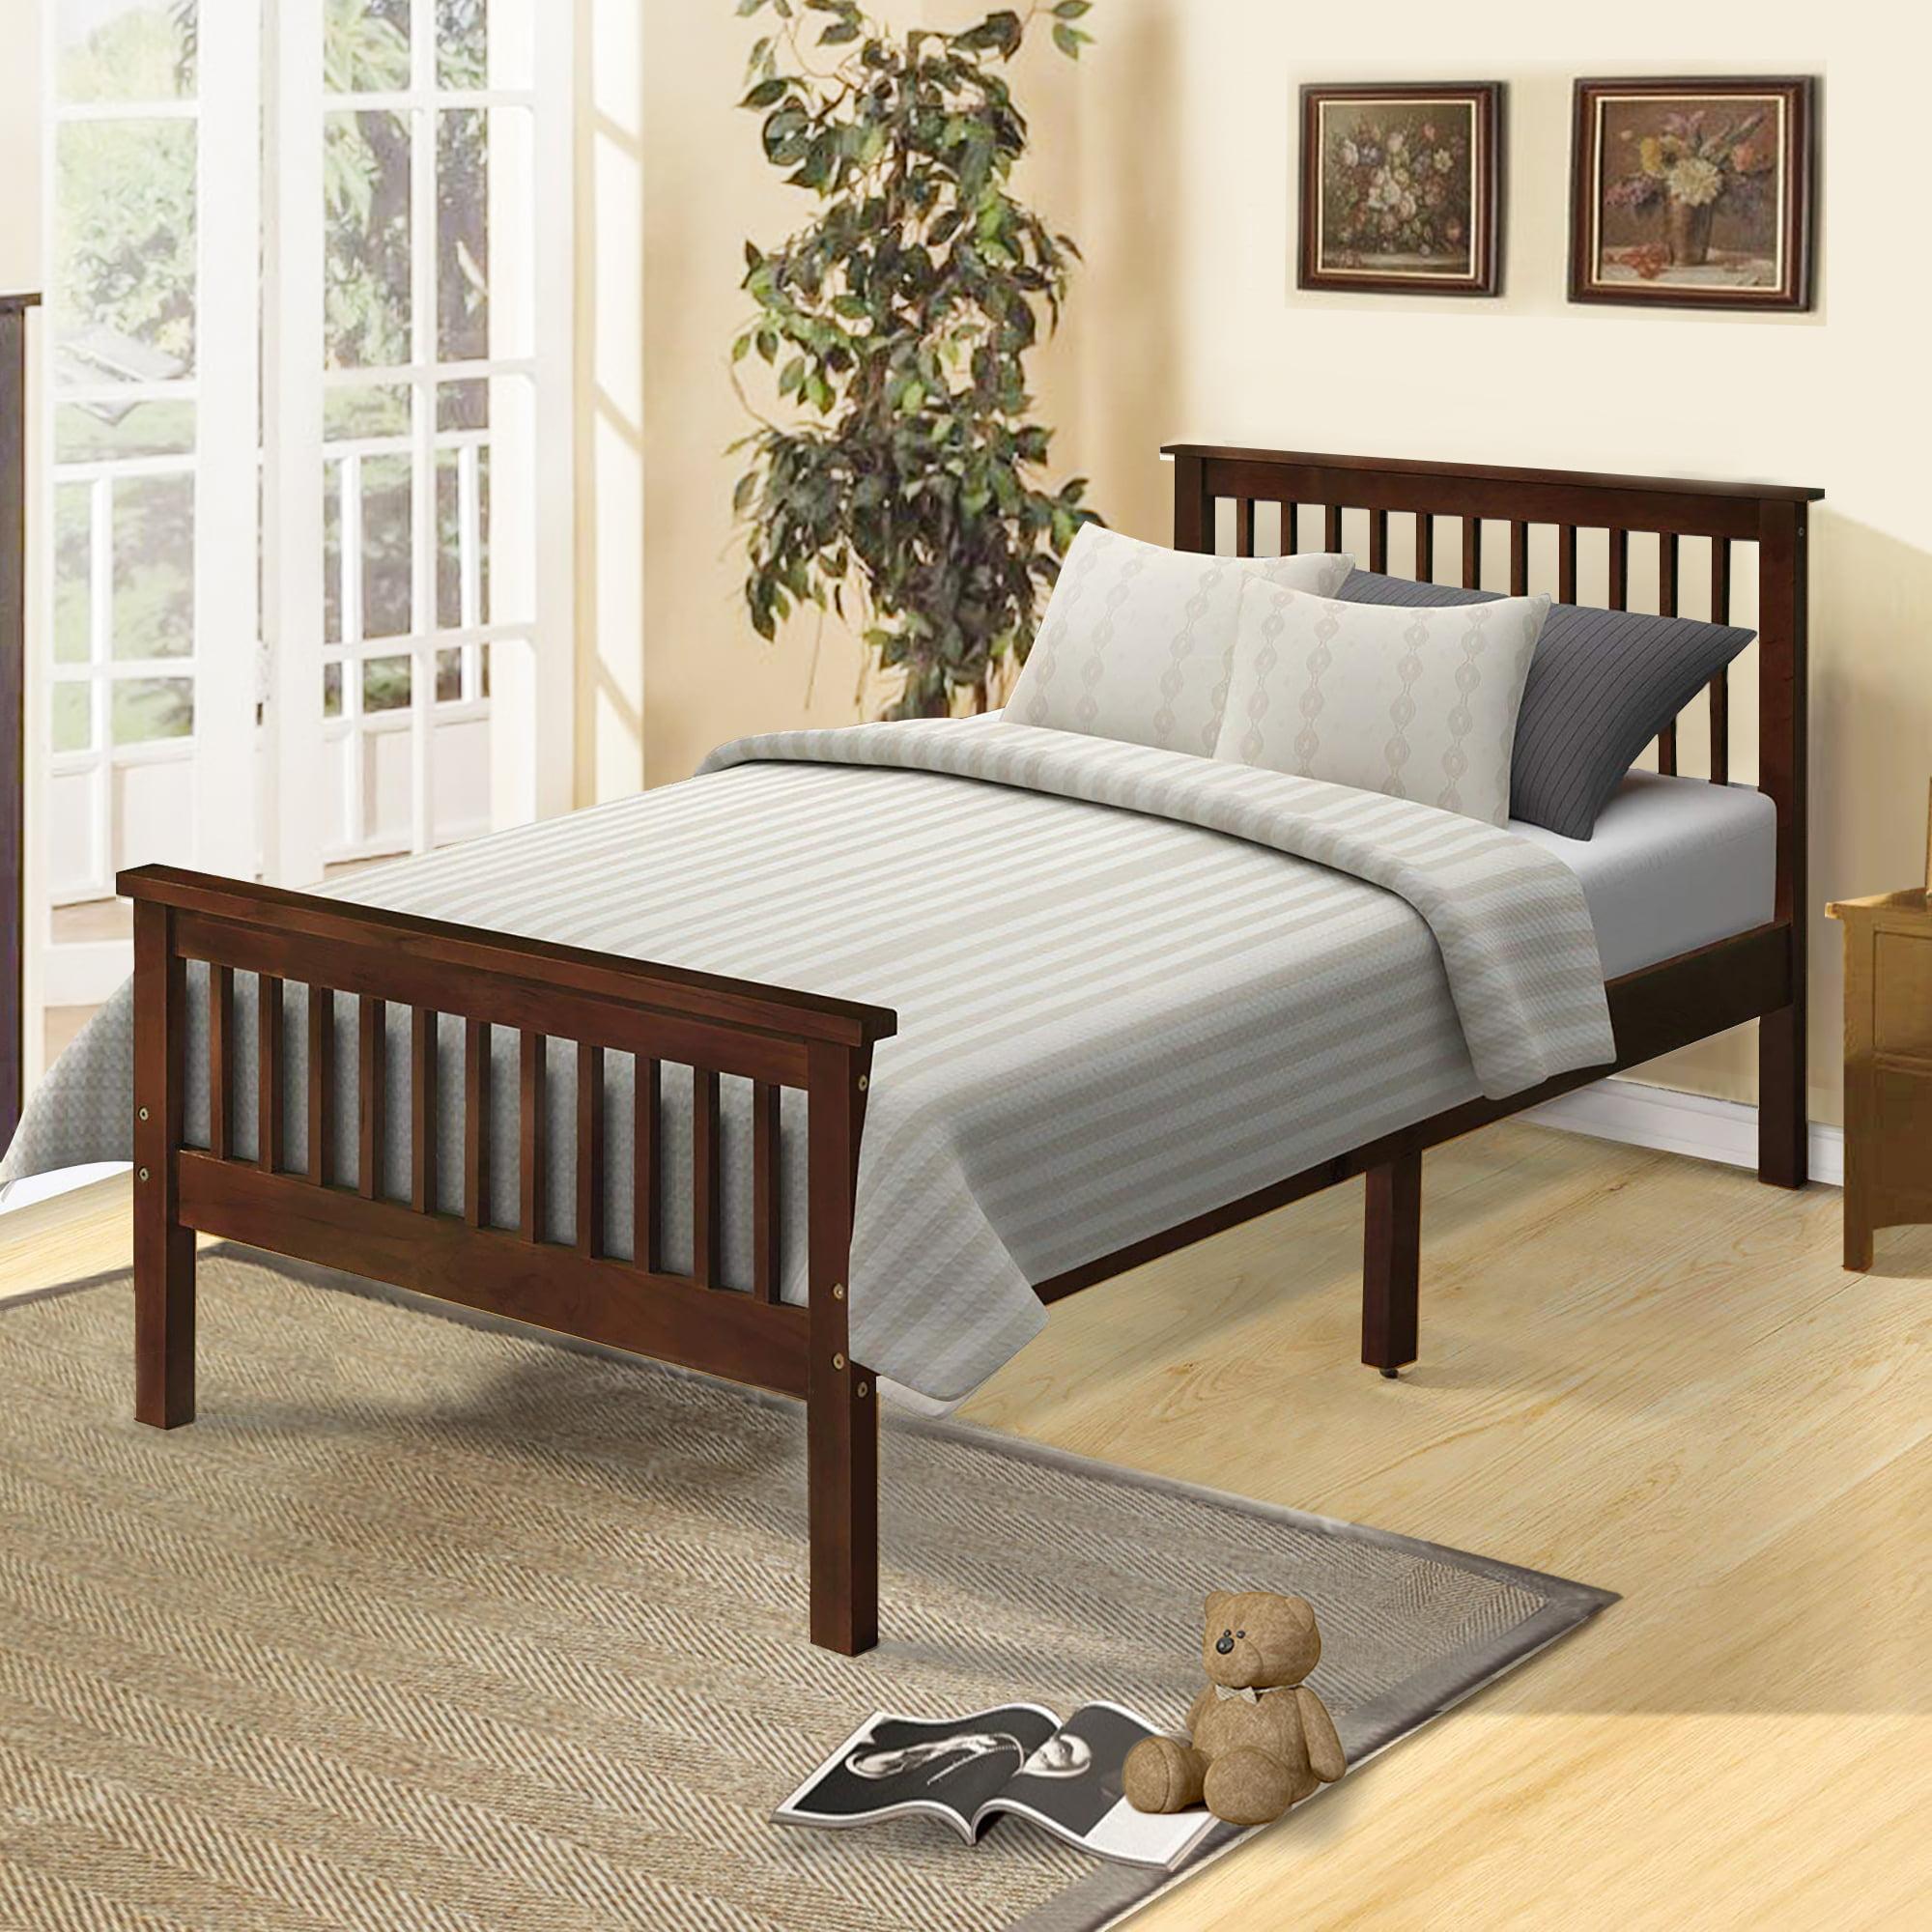 Clearance! Twin Bed Frames for Kids, Heavy Duty Wood Twin ...